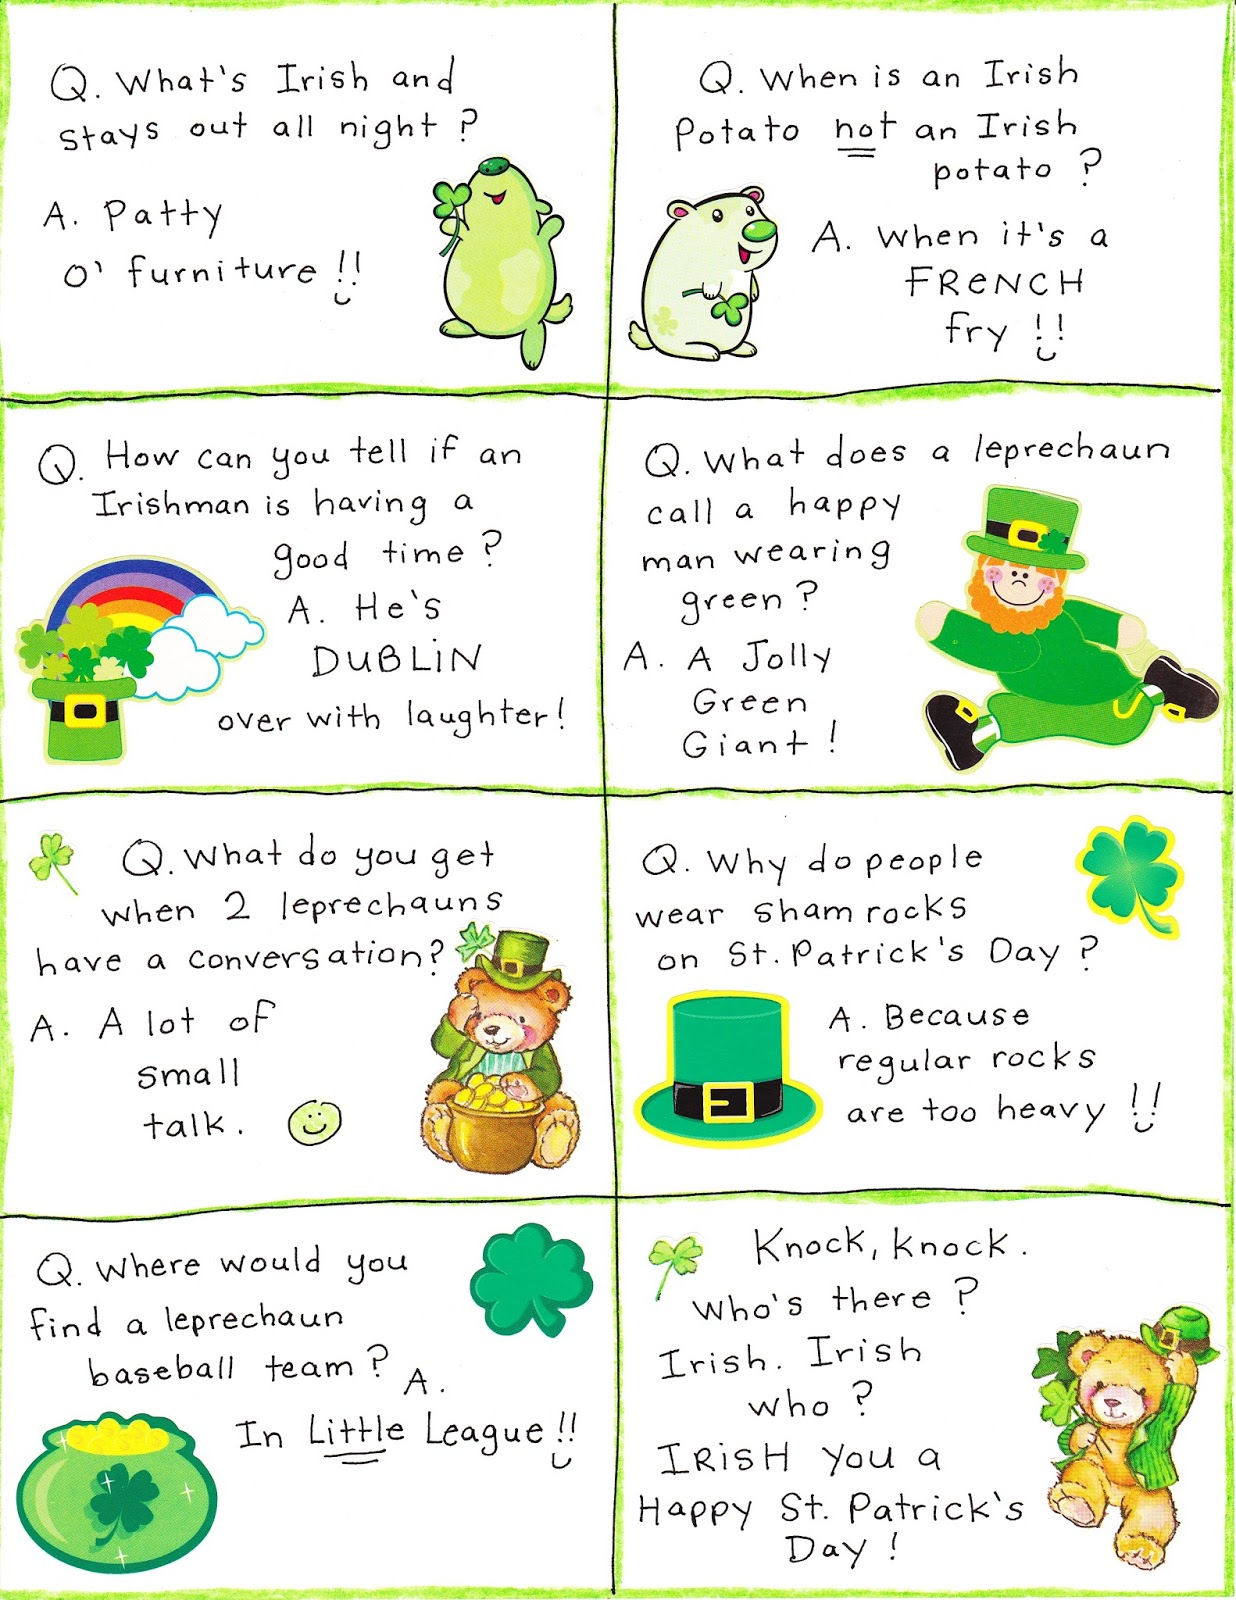 Saint Patrick S Day Irish Jokes Limericks Riddles